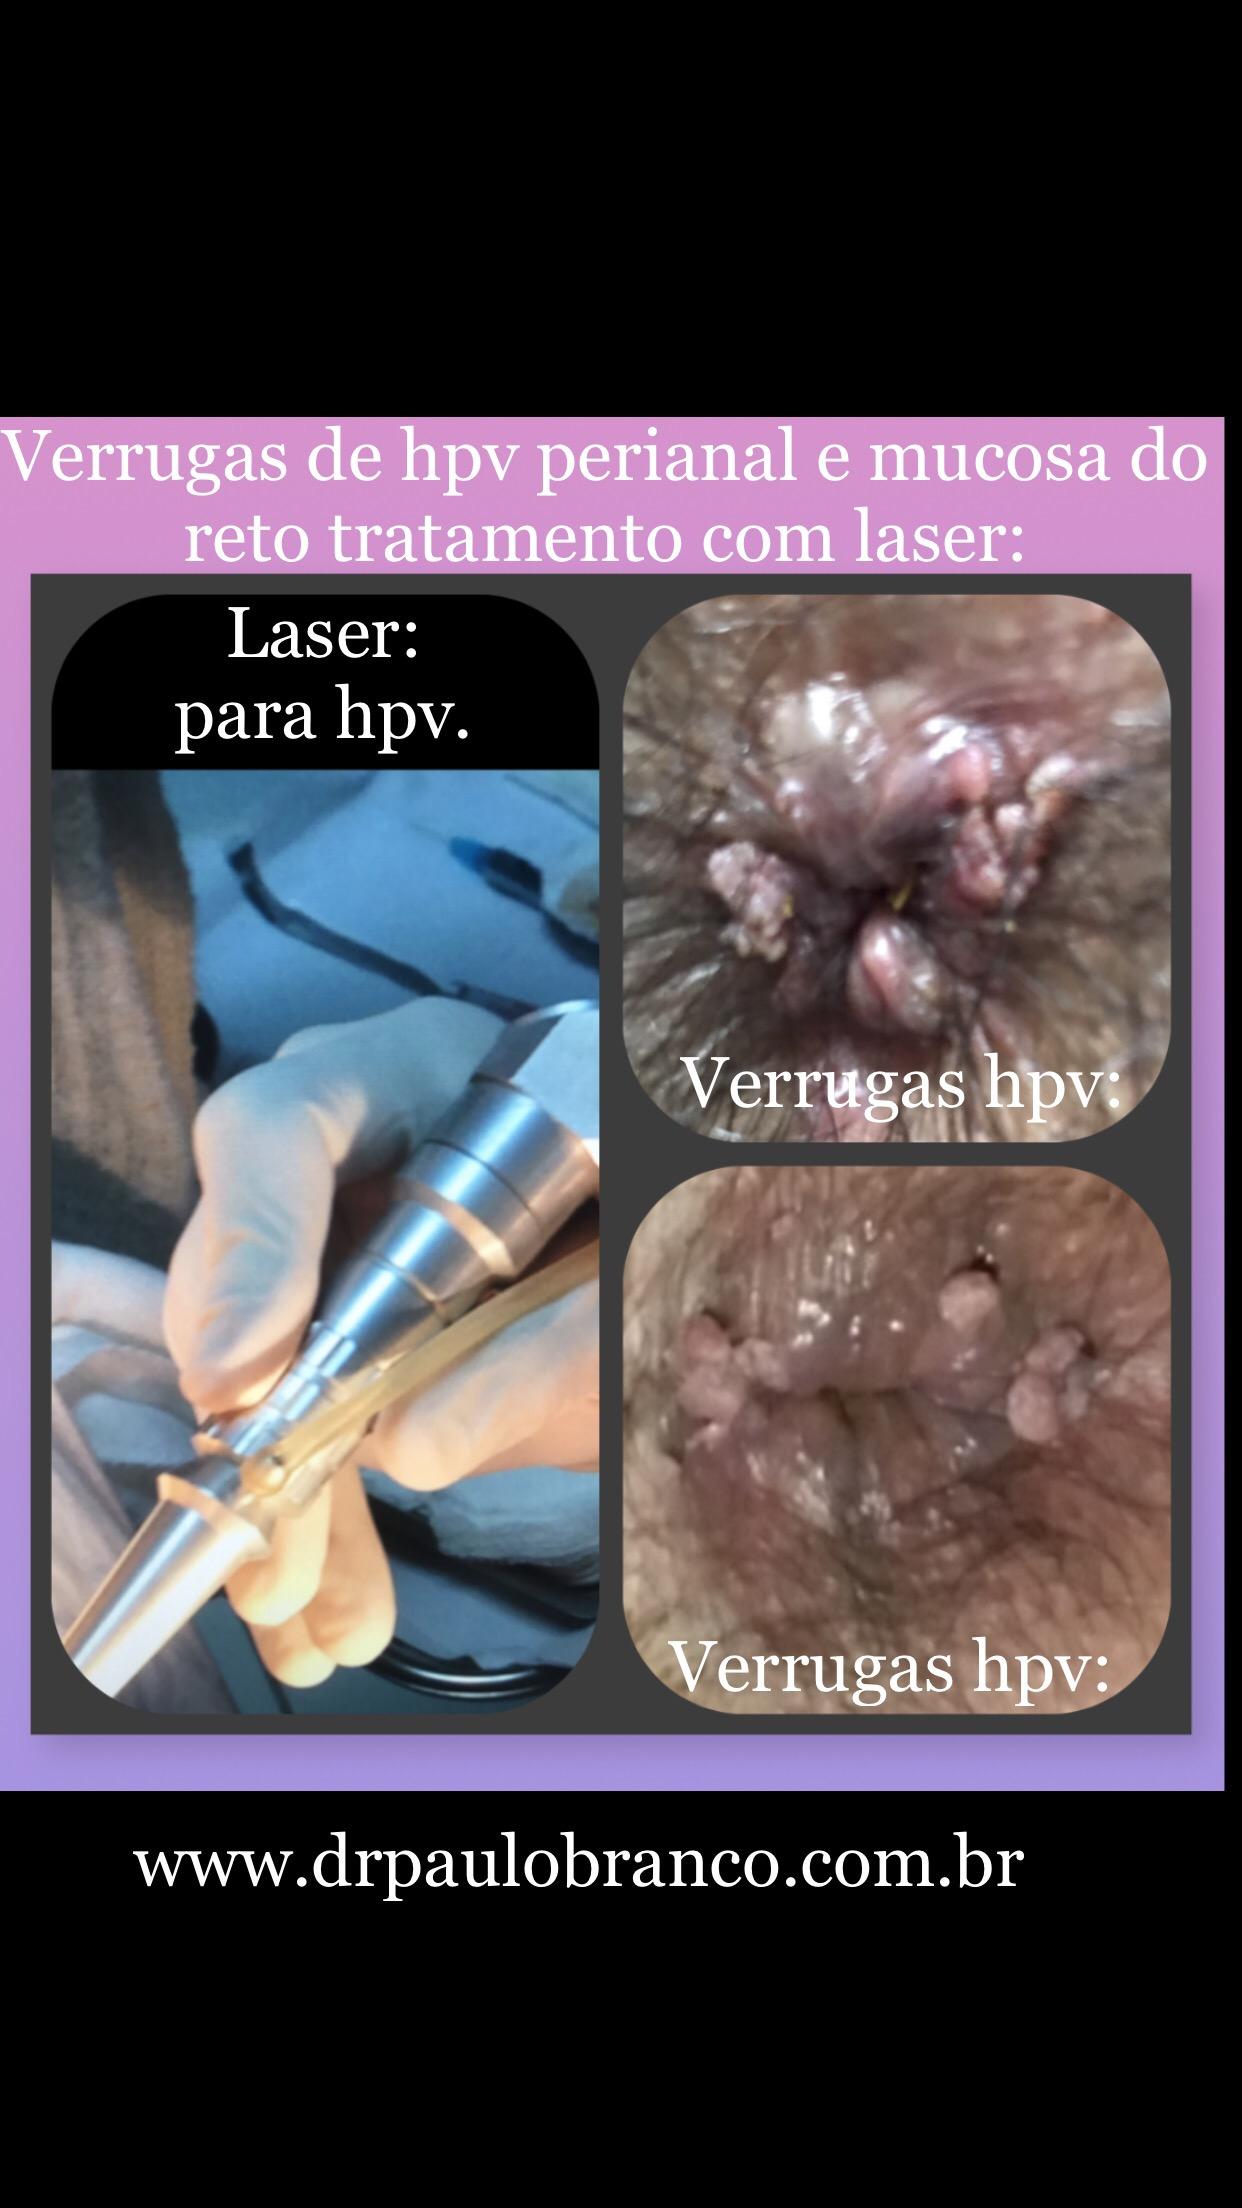 Verrugas de hpv tratadas com laser.